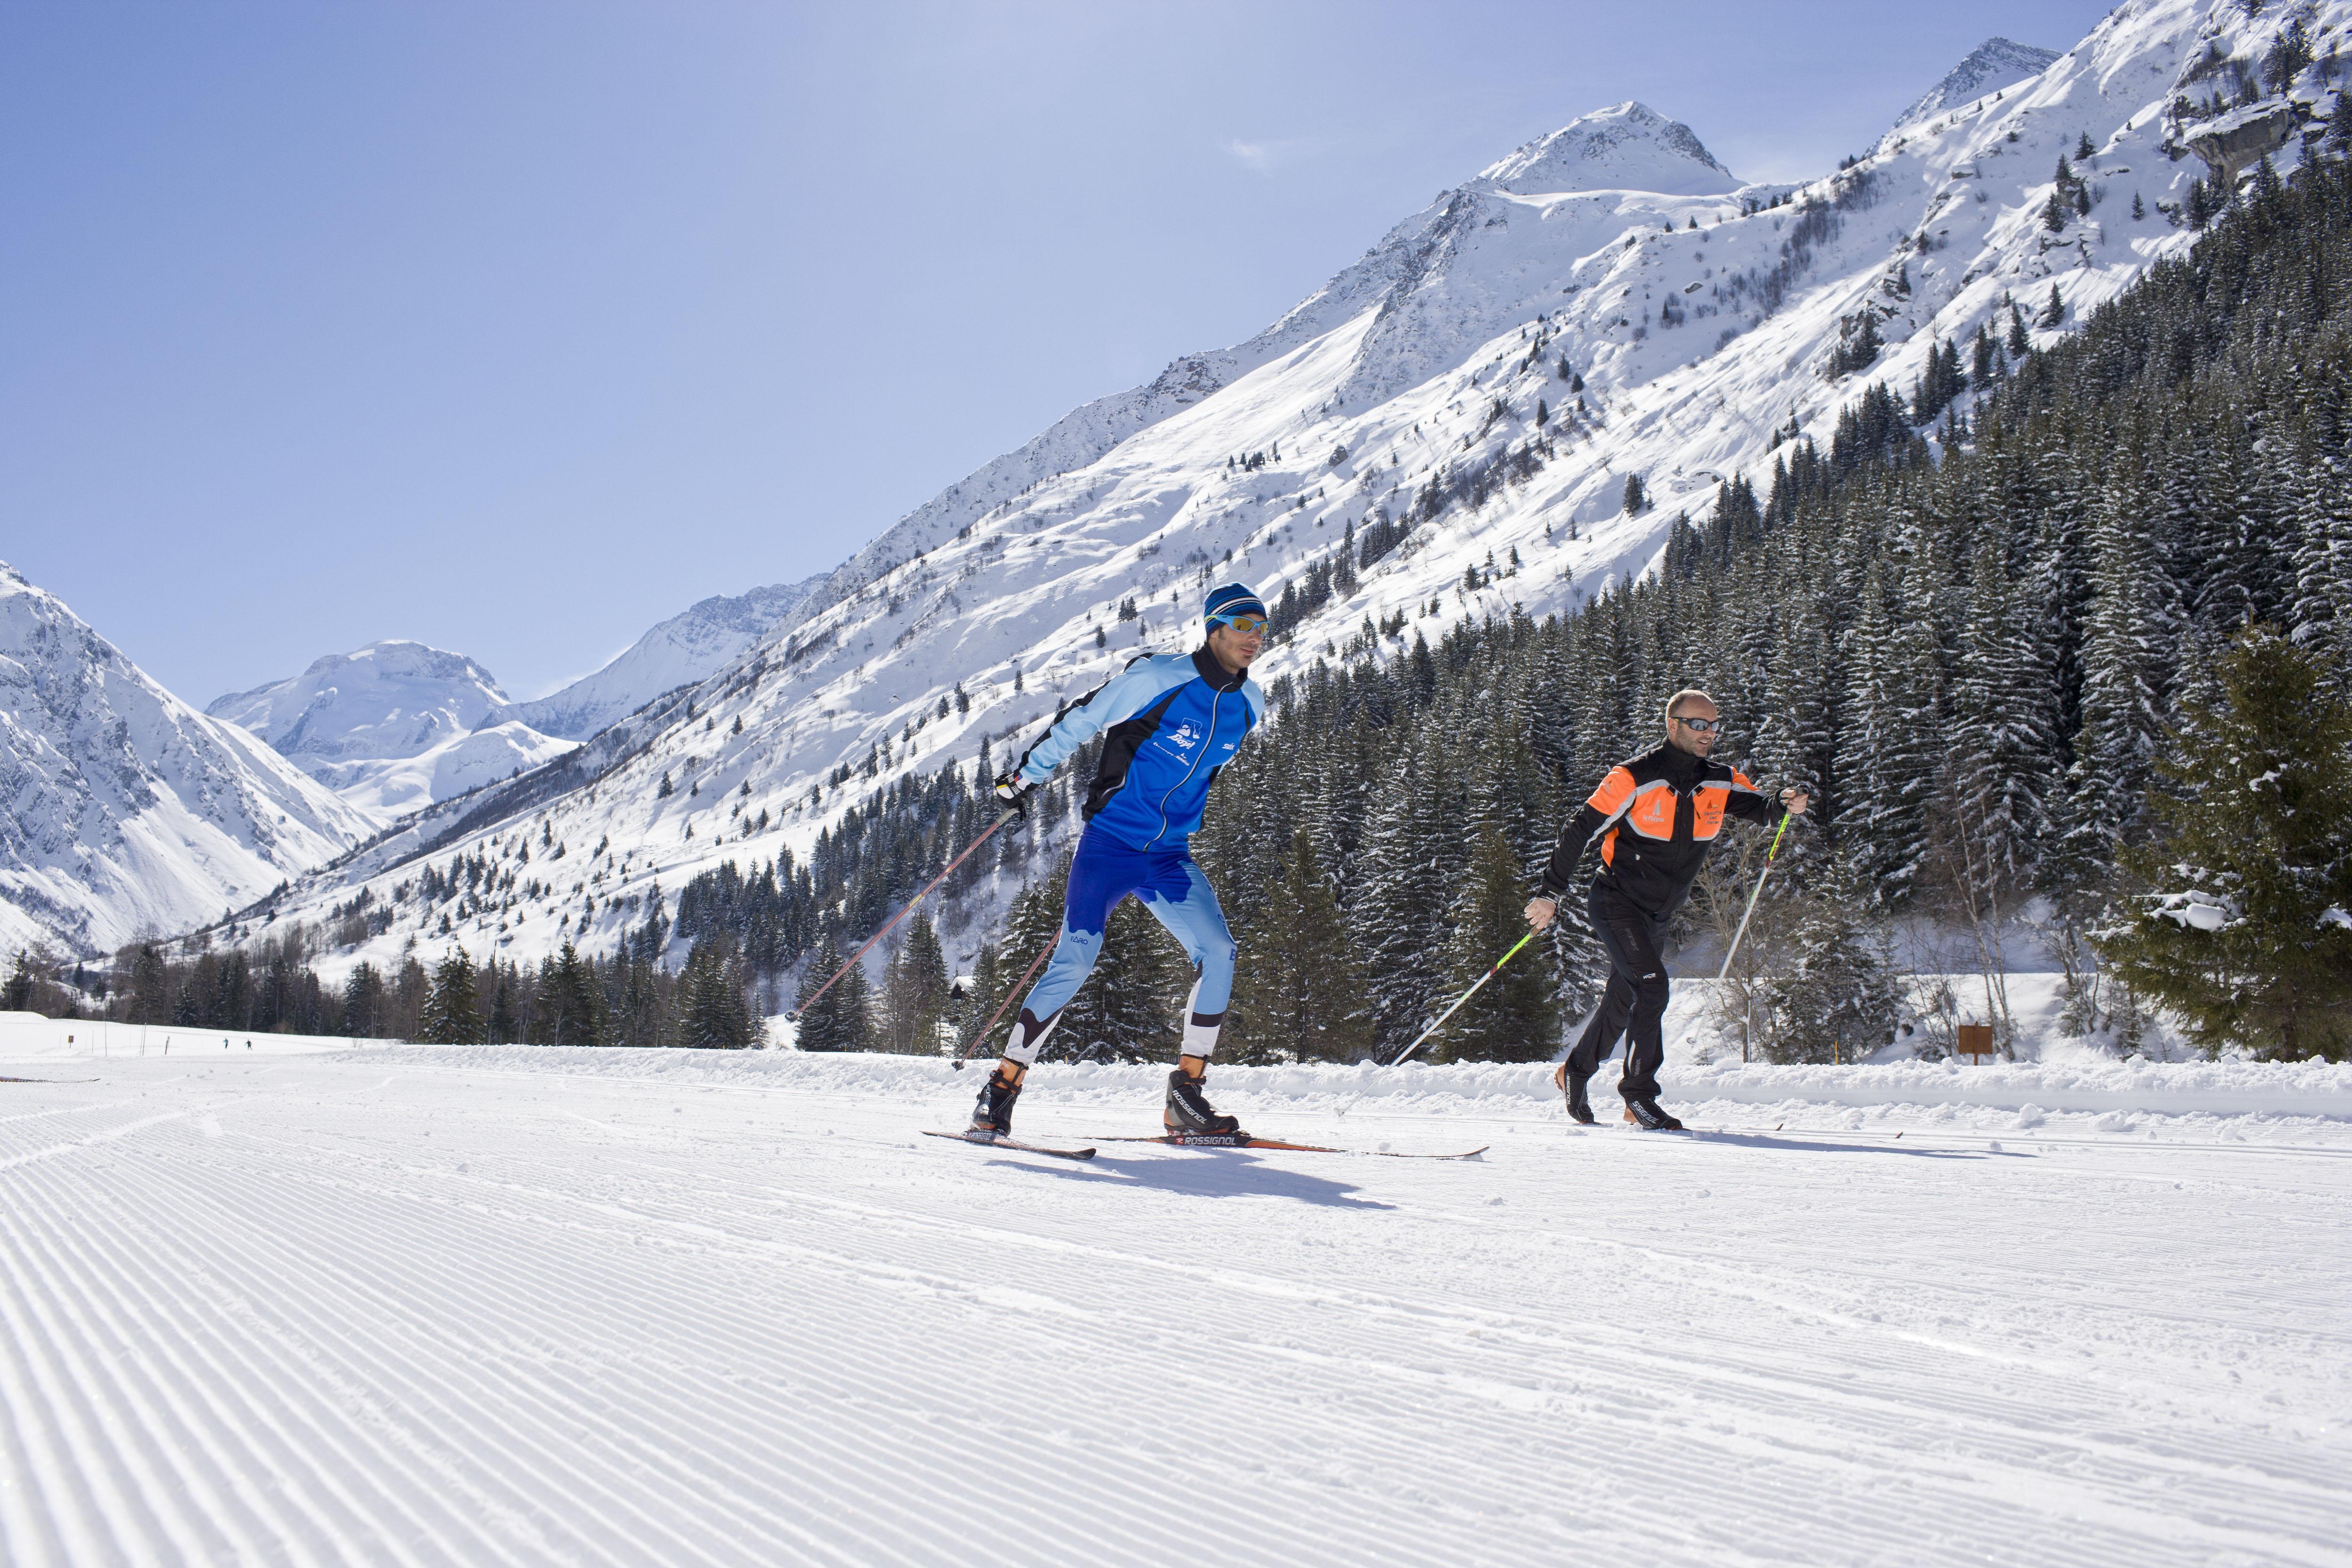 station ski Champagny-en-Vanoise